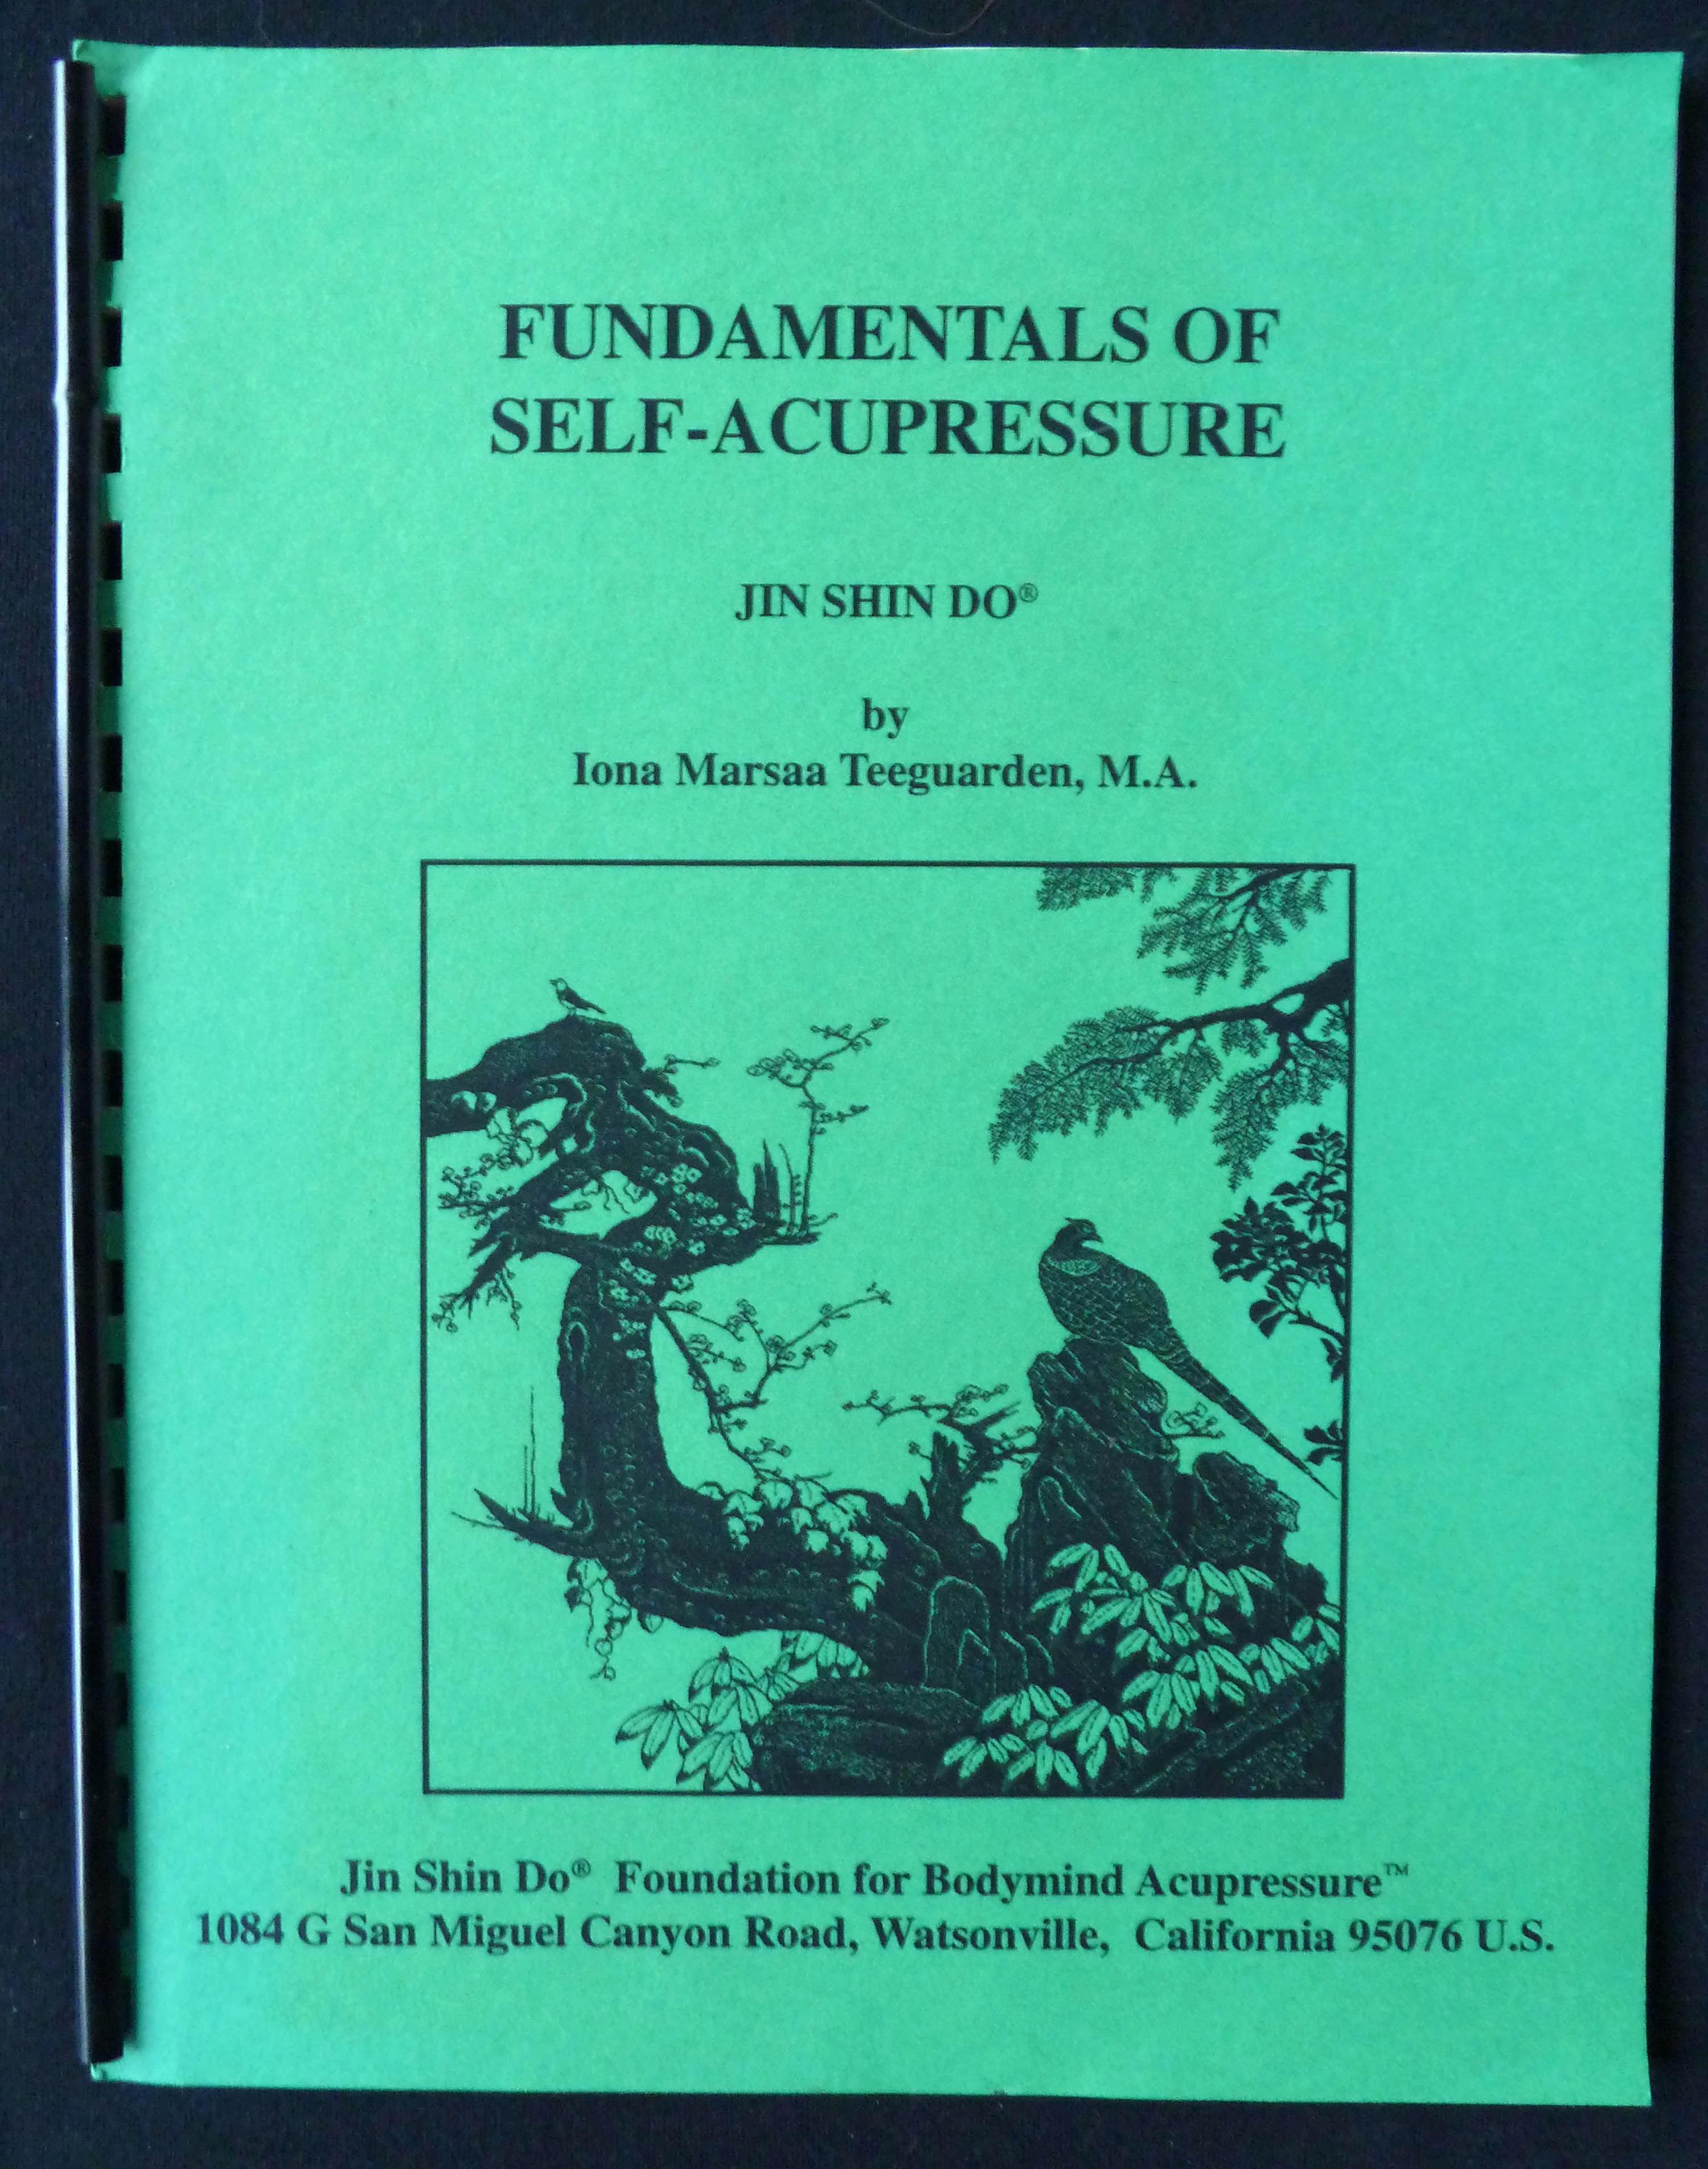 Fundamentals of Self-Acupressure Jin Shin Do by Iona Marsaa Teeguarden -  1989 - from Limebay Books and Biblio com